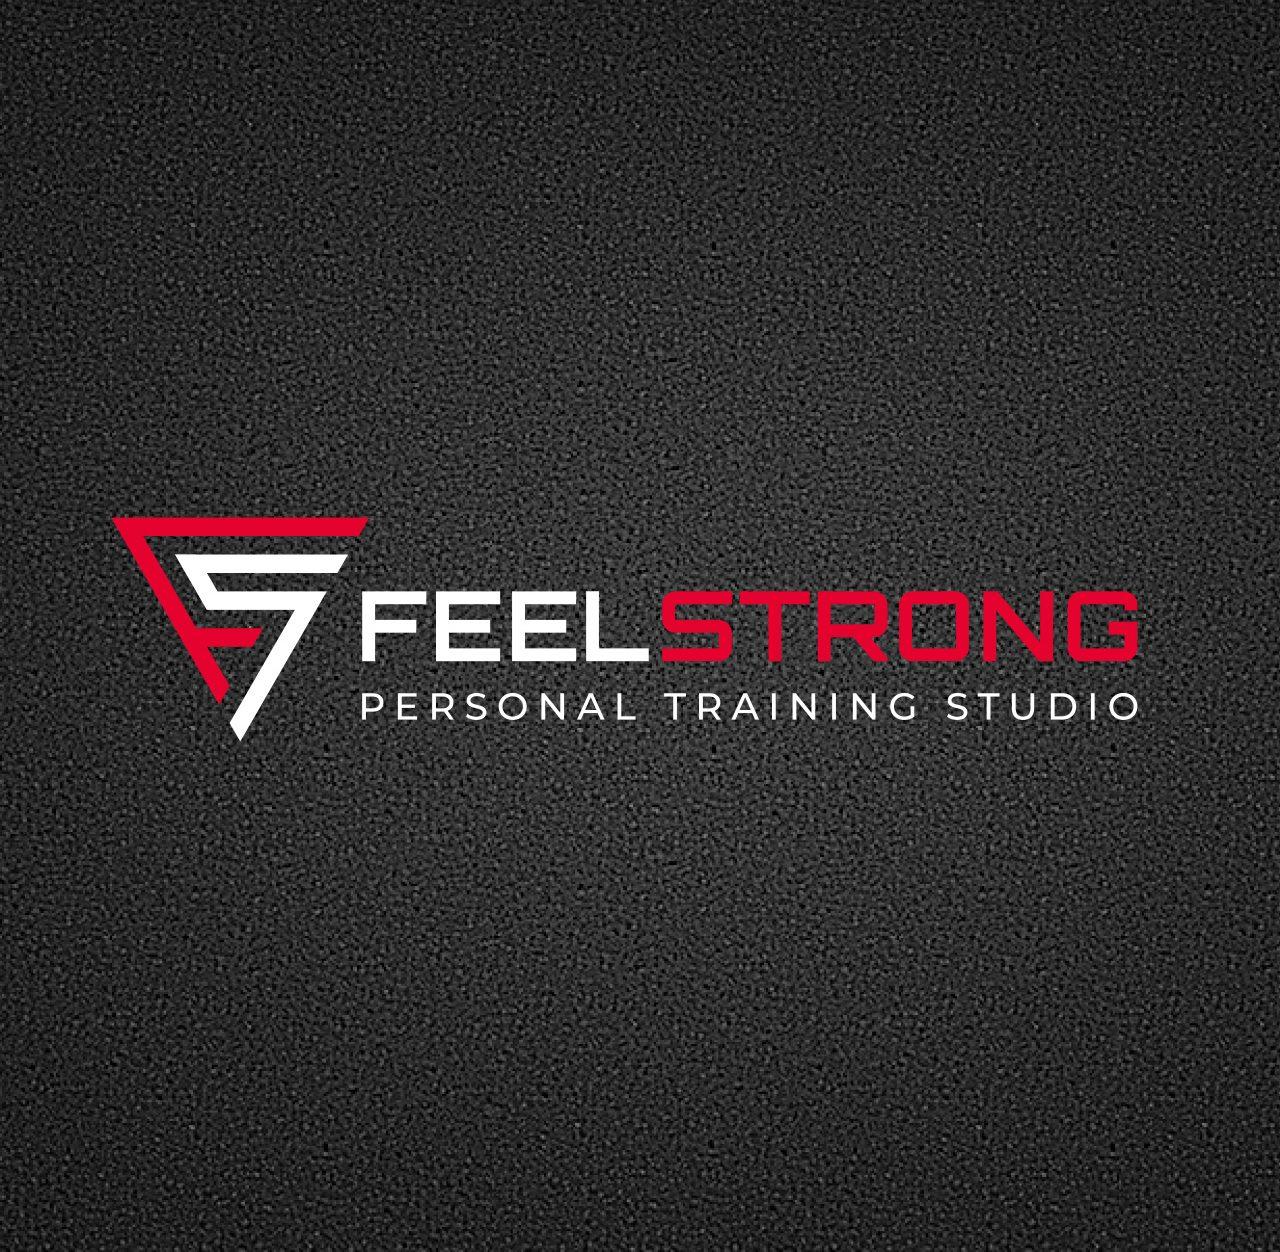 feelstrong_1280x1280